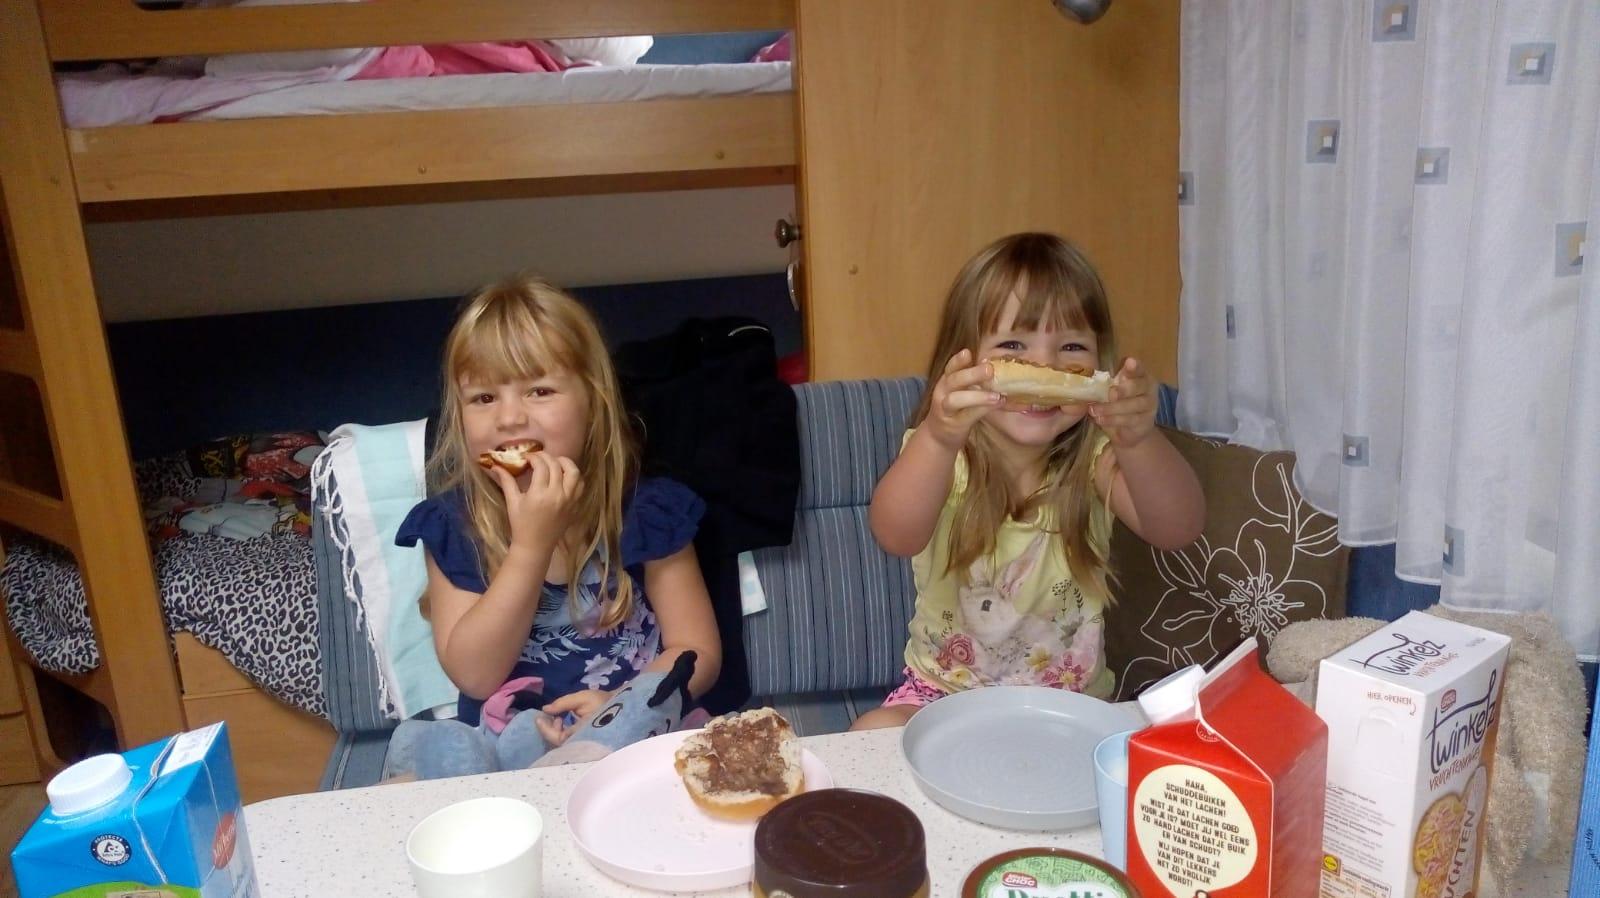 caravan, kamperen, drie kinderen, familytime, gezin, buiten, camping, nazomer, mamalifestyle, mamablog, lalogblog, lalog.nl, lalog